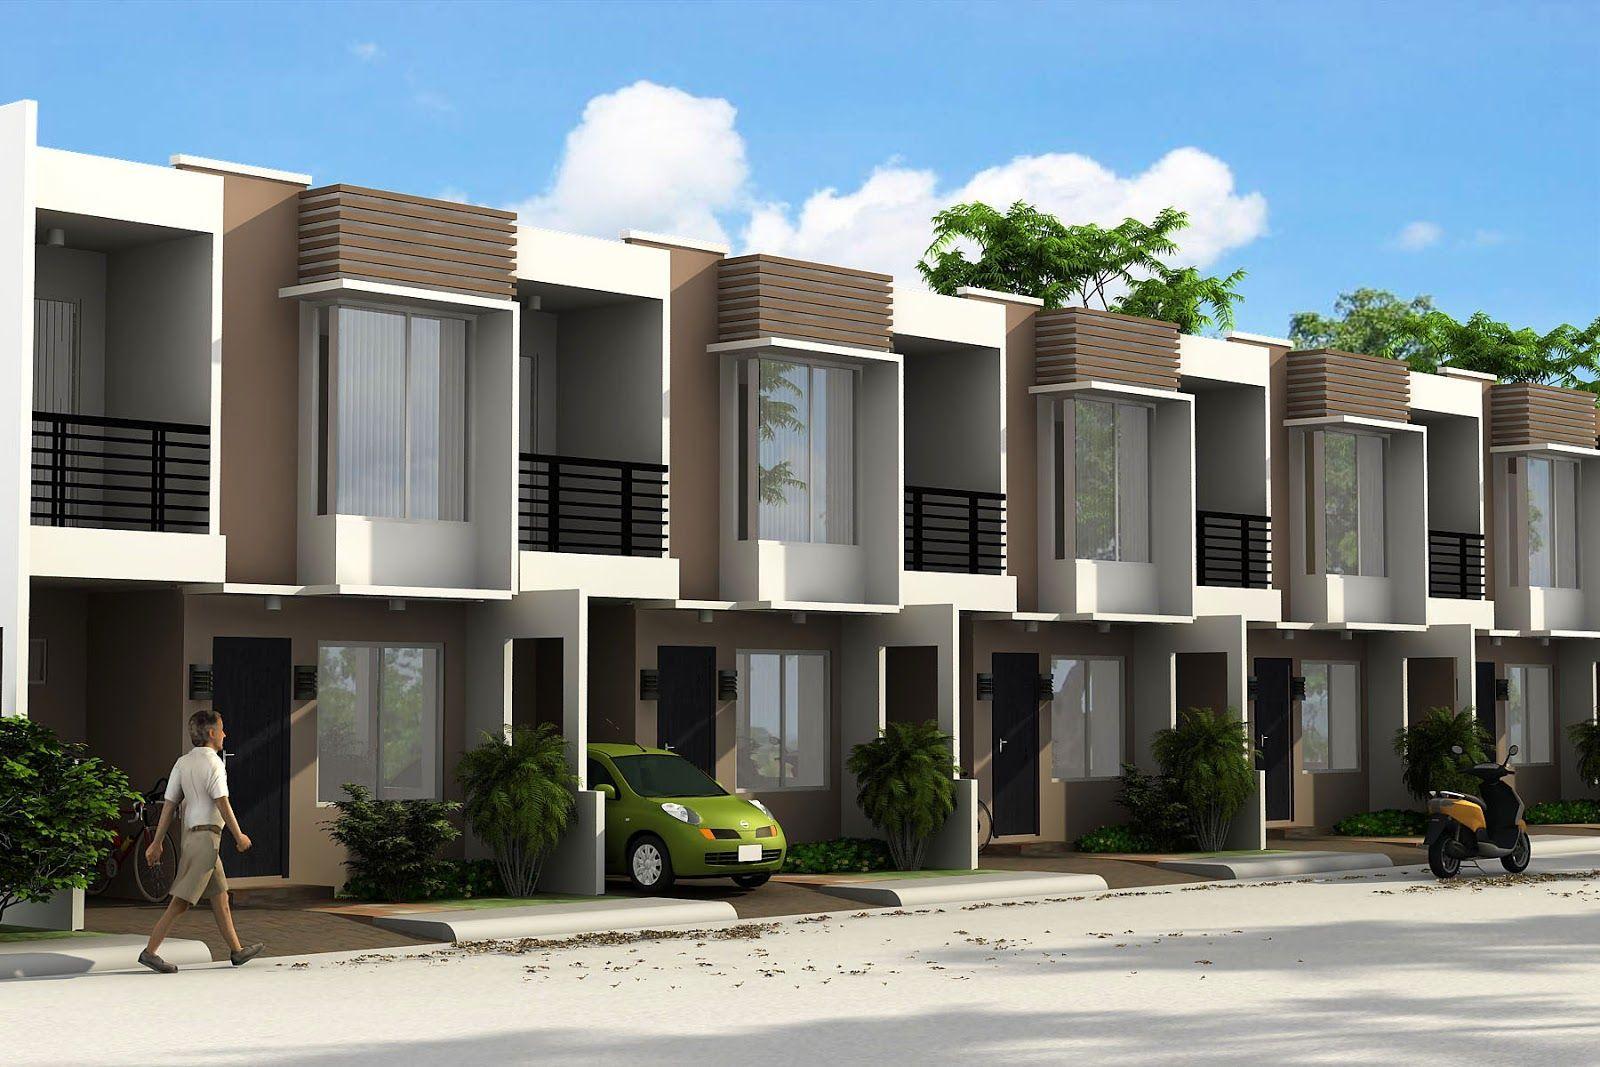 Row House Exterior Design Philippines In 2020 Townhouse Exterior Townhouse Designs Row House Design